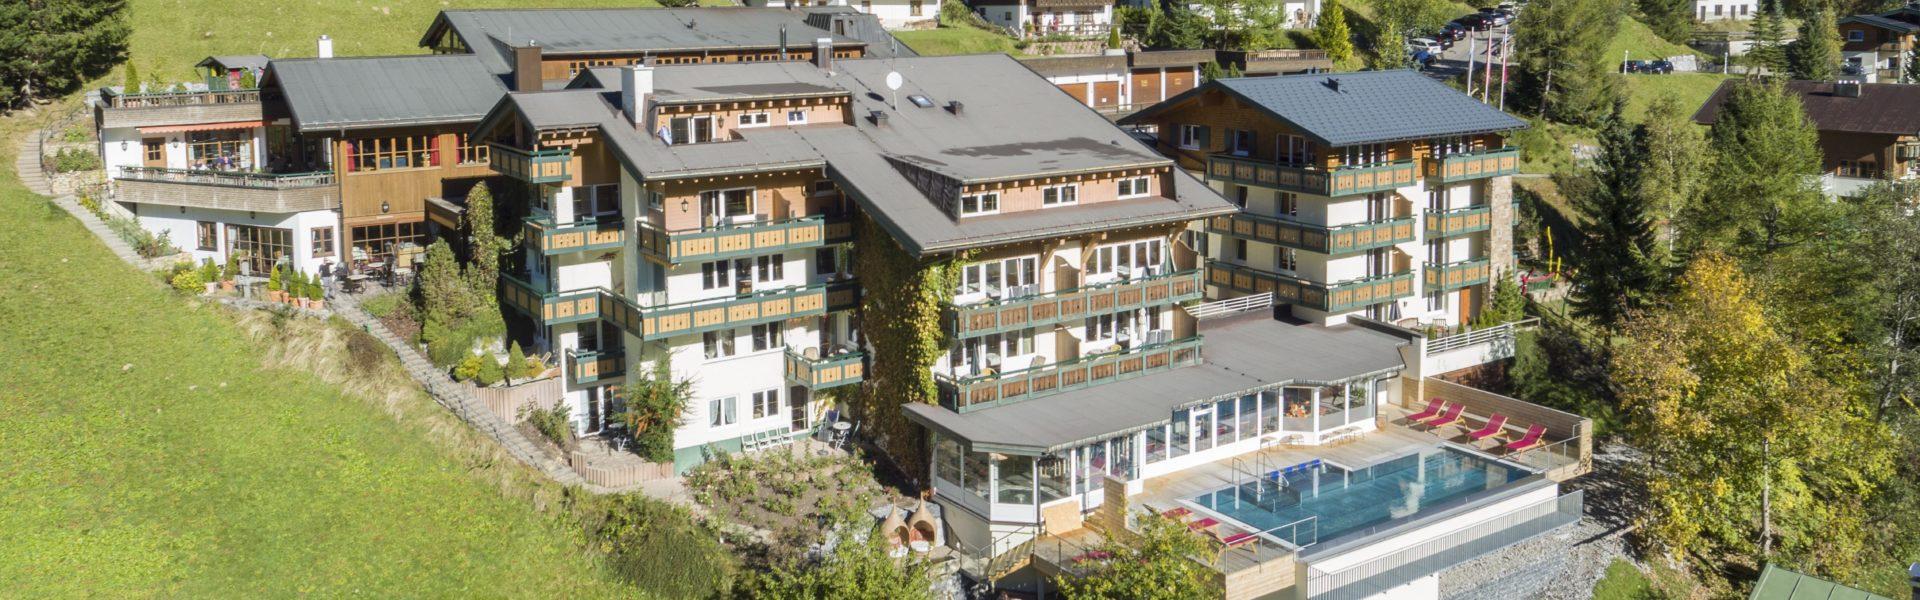 Top Family Familienhotel Kleinwalsertaler Rosenhof, Mittelberg, Luftaufnahme © Ingo Wandmacher/Der Kleinwalsertaler Rosenhof